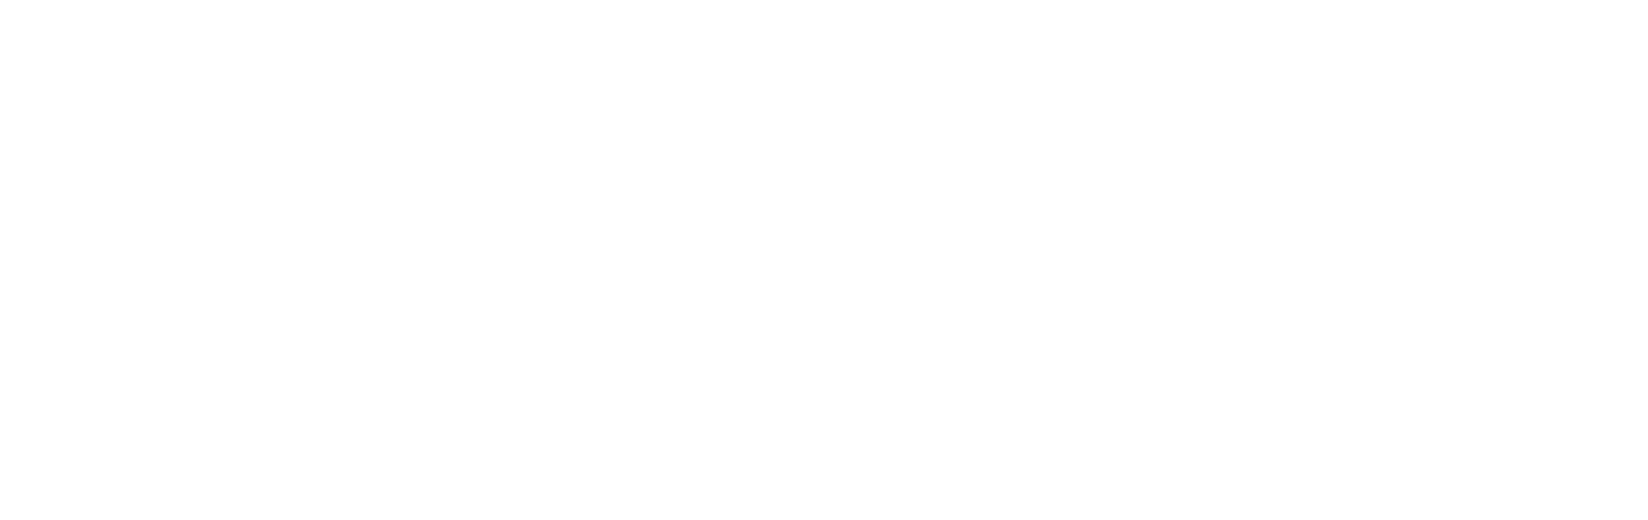 IT 잡매니저 토선생 당신에게 좋은 일자리를!  Good workplace to you IT Job Management Service